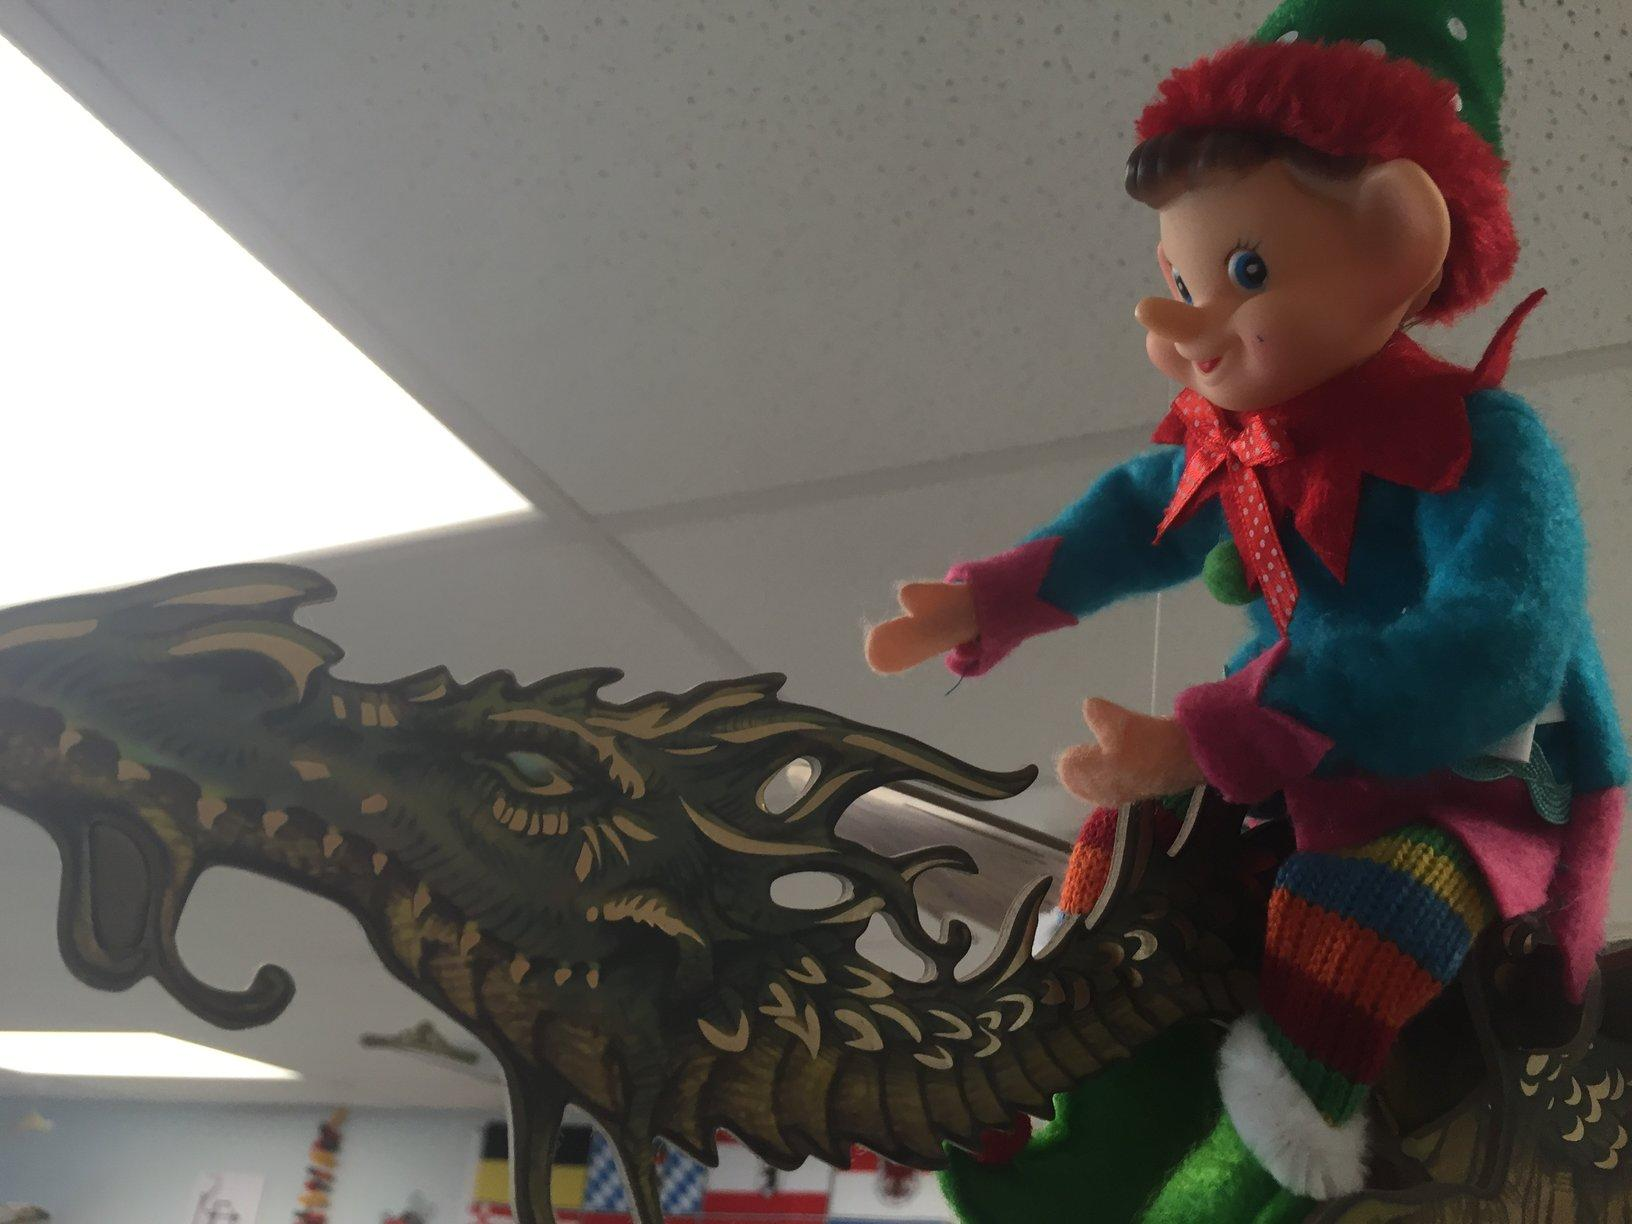 Where's elfie hiding today?